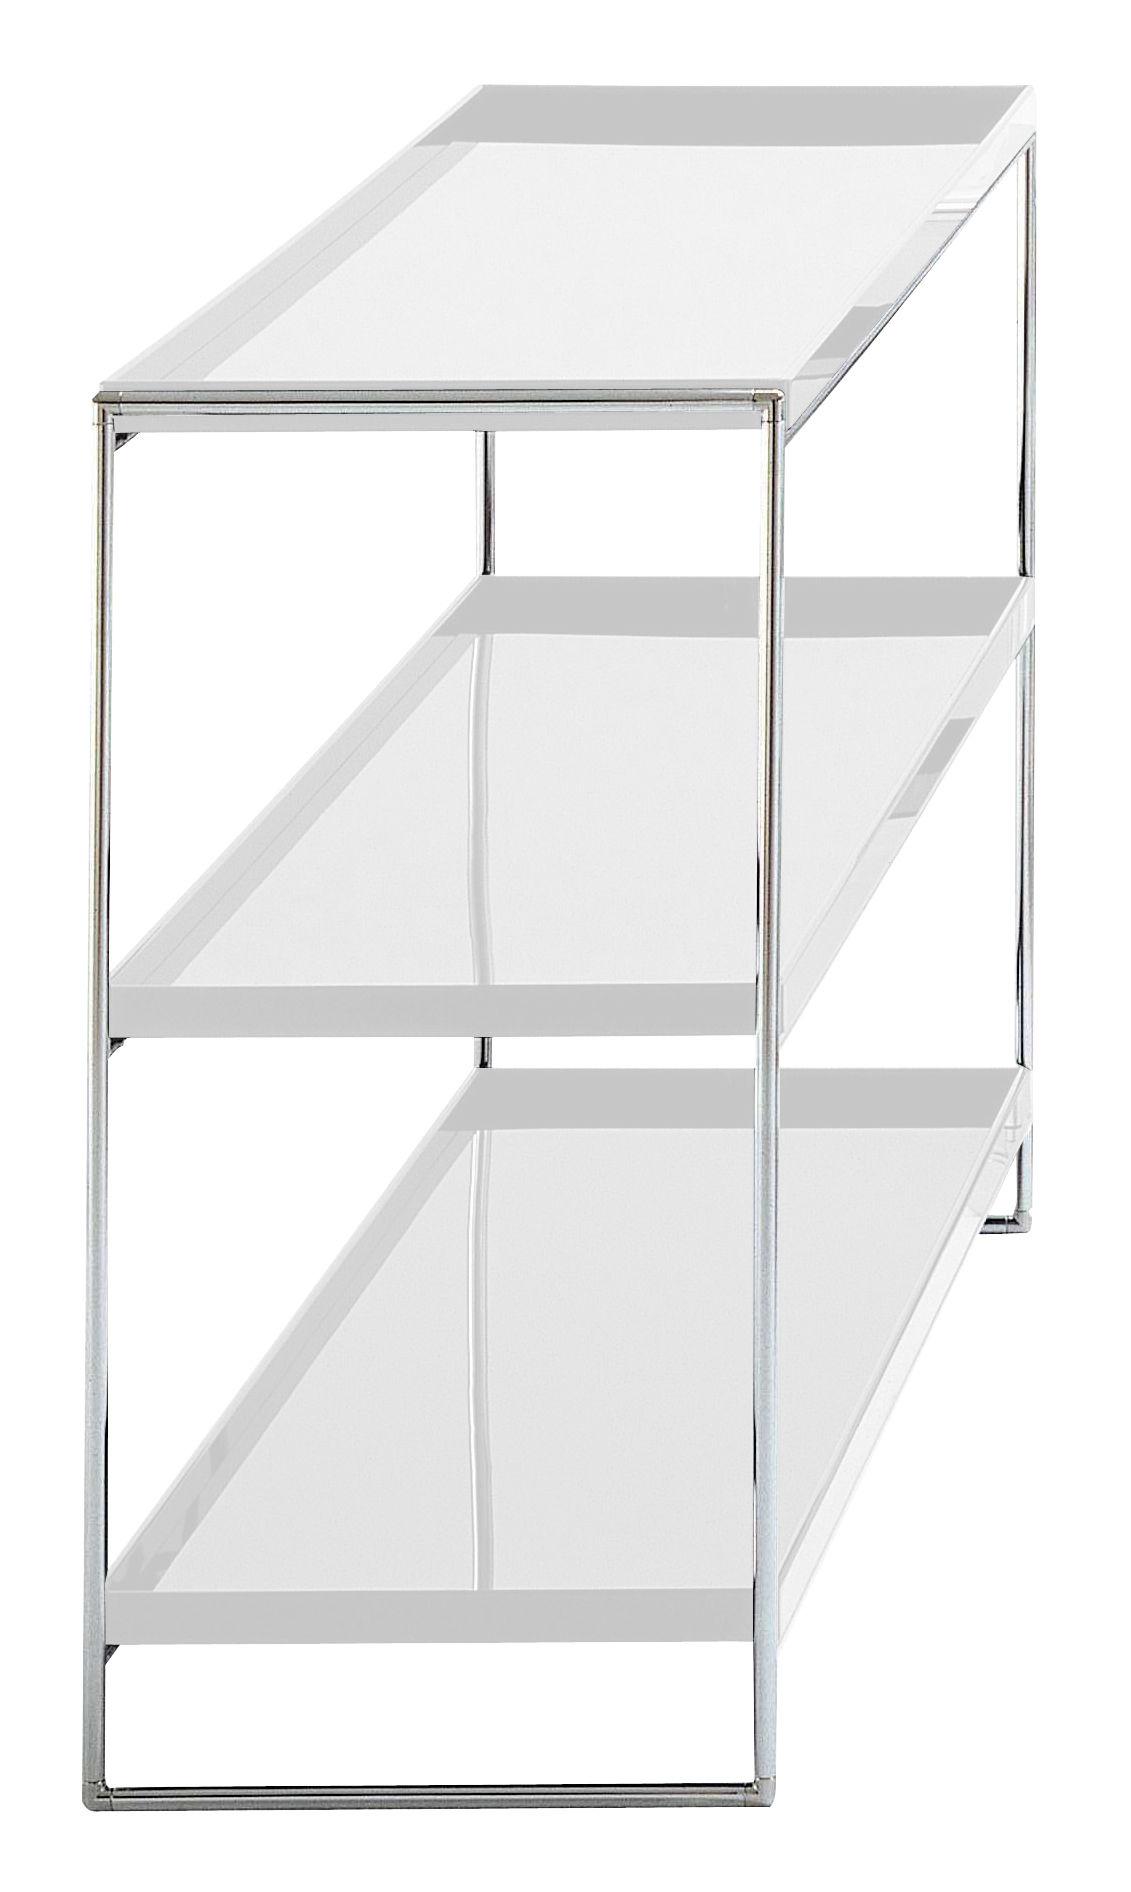 etag re trays blanc kartell. Black Bedroom Furniture Sets. Home Design Ideas